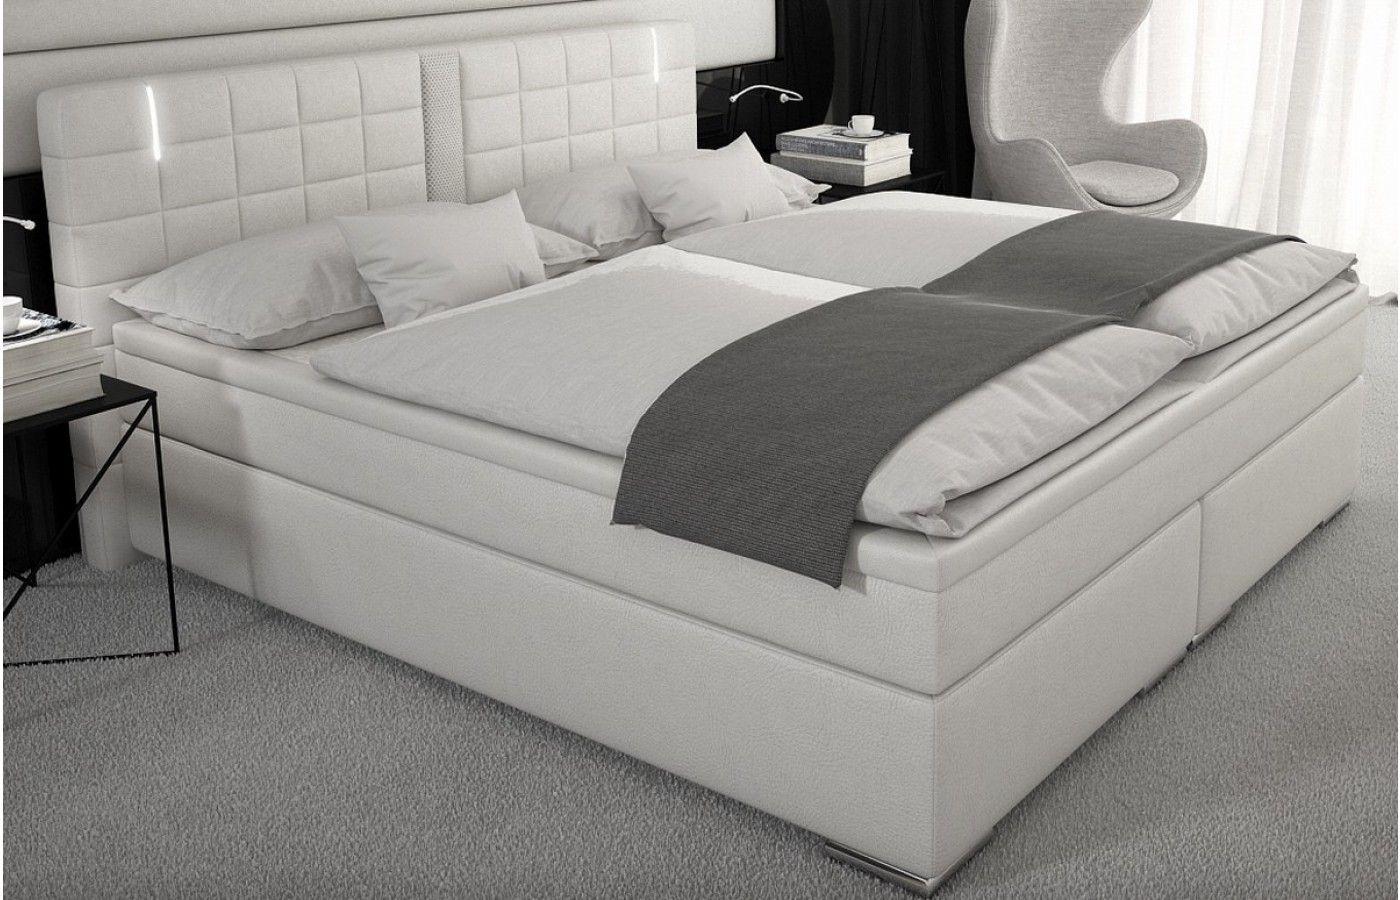 Design Boxspring Bett Mit Rundum Led Beleuchtung Exklusiv Auf Sofa Dreams Sofa Gunstig Kaufen Boxspringbett Sofa Design